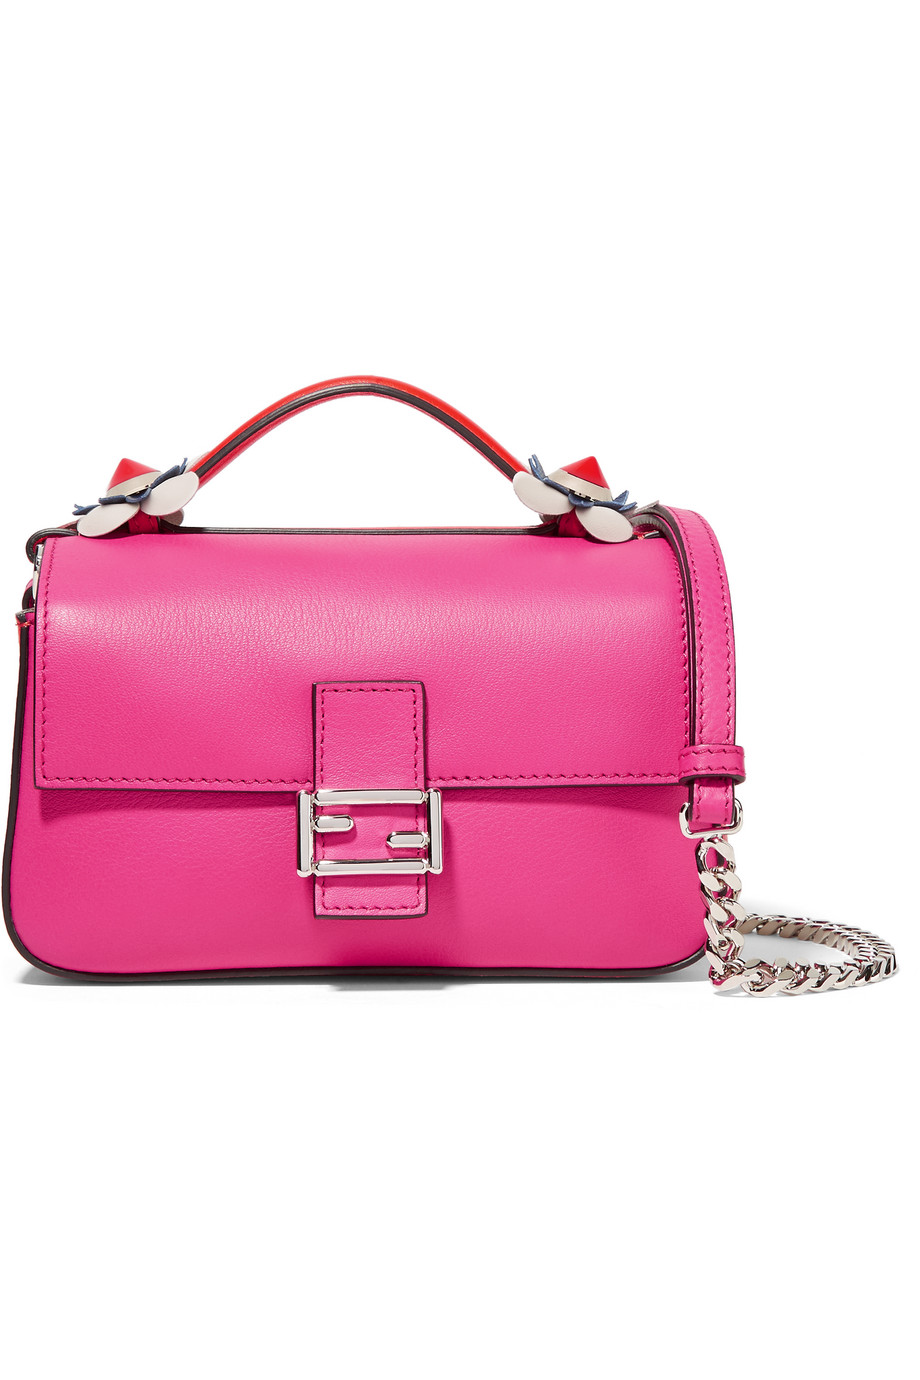 Fendi Double Baguette Micro Leather Shoulder Bag, Fuchsia, Women's